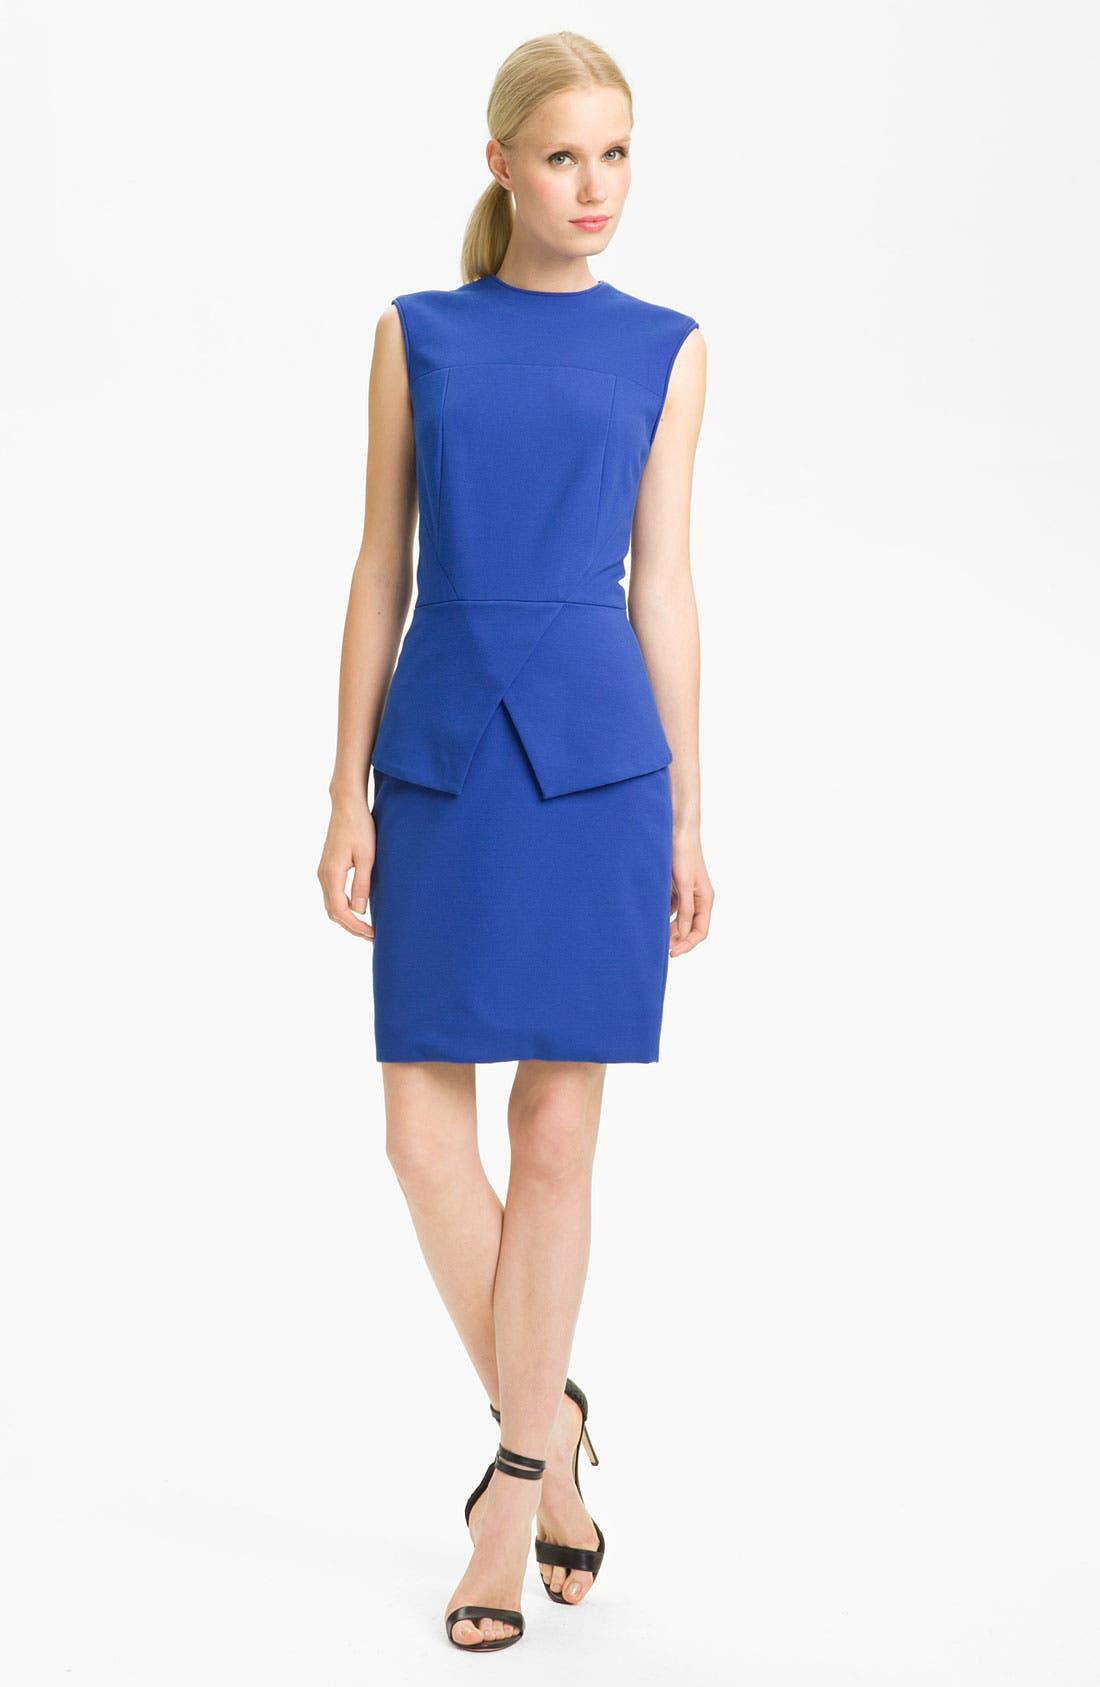 Alternate Image 1 Selected - Tibi Peplum Ponte Dress